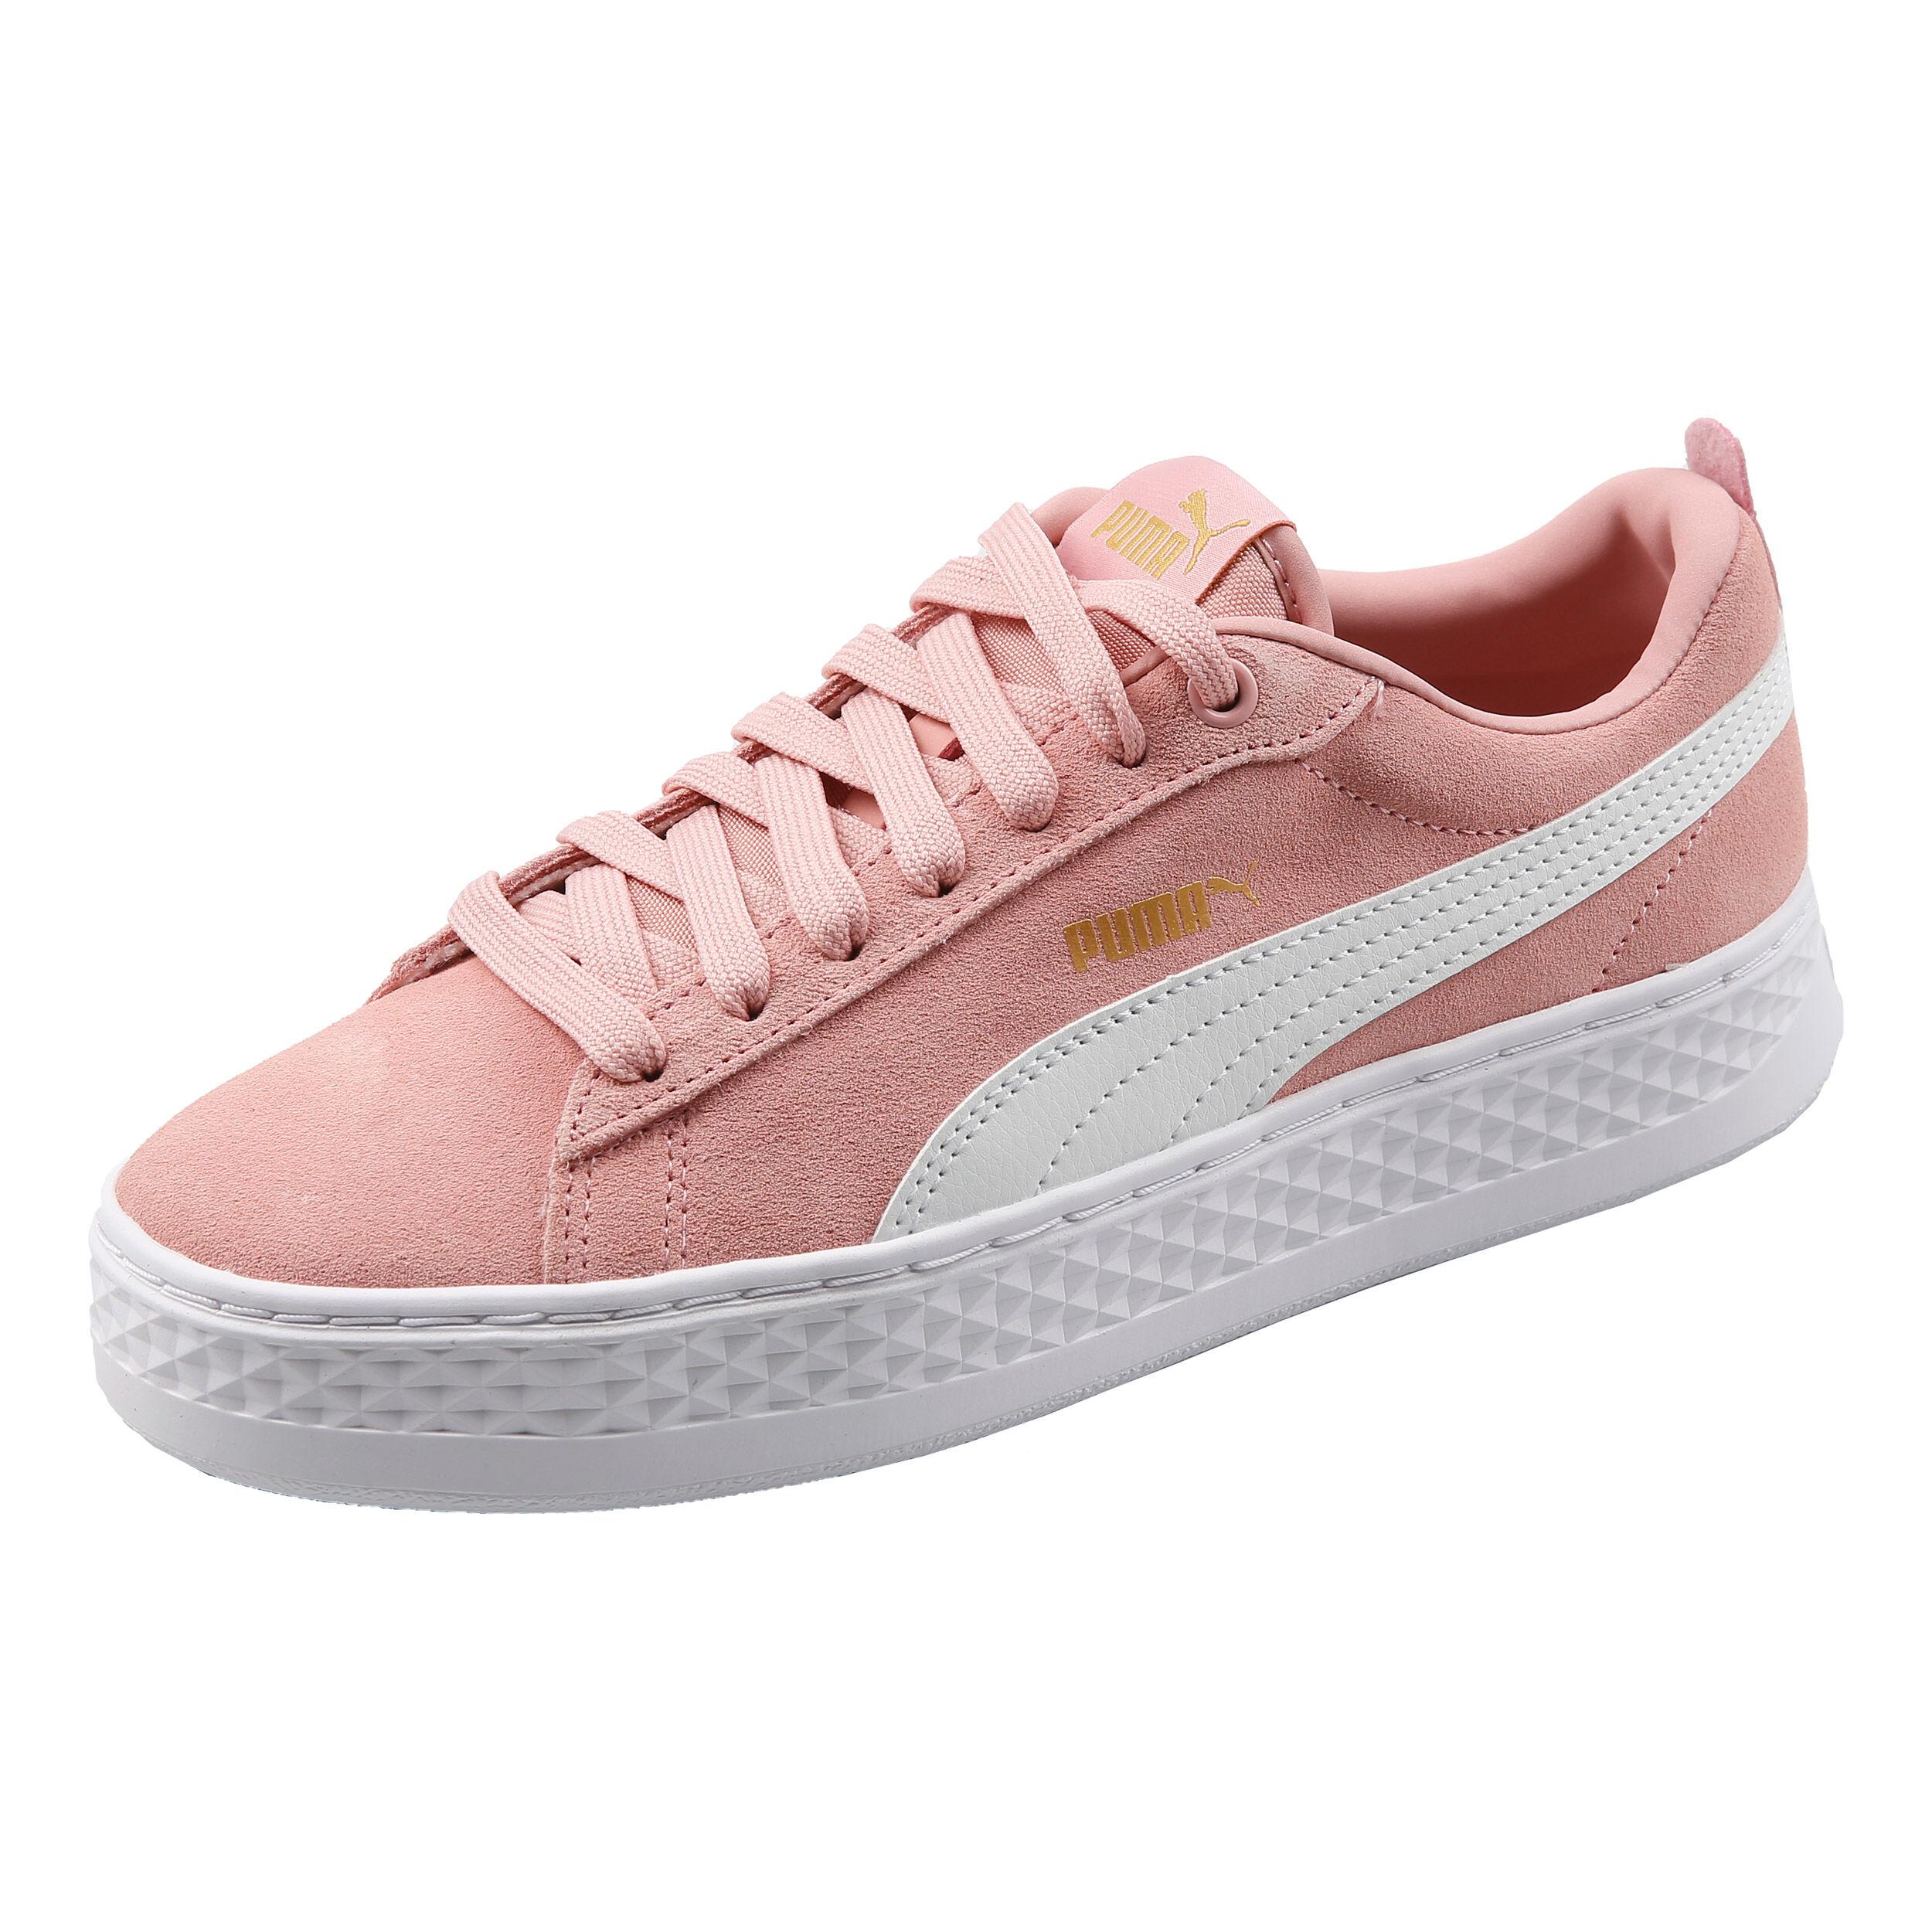 Puma Smash Platform SD Sneakers Women